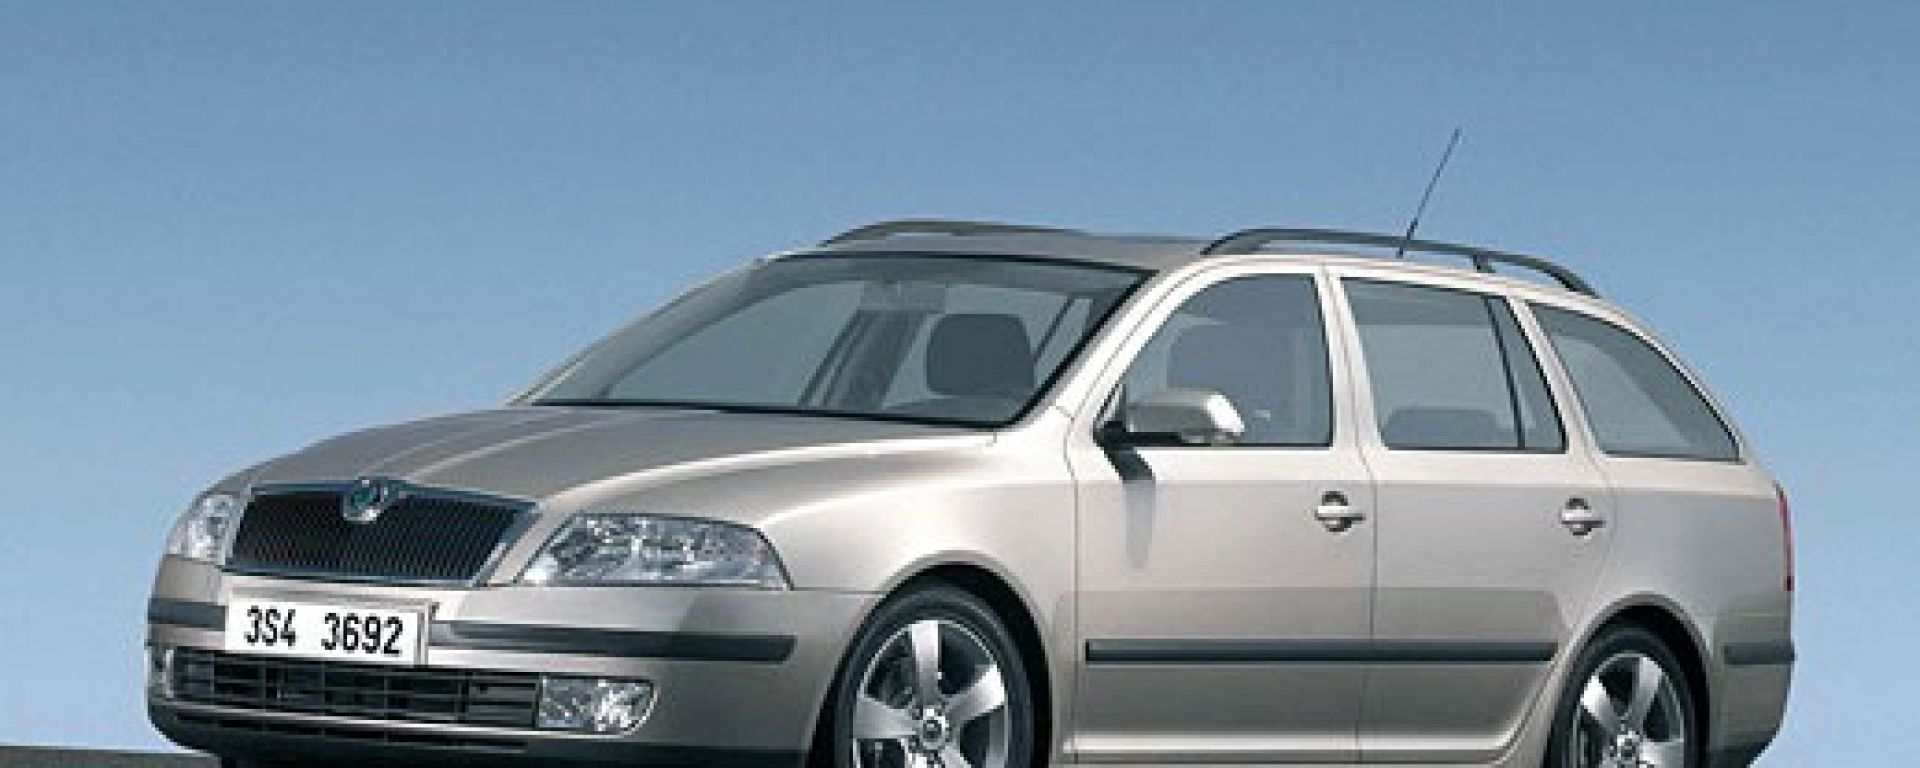 Anteprima: Skoda Octavia Wagon 2005